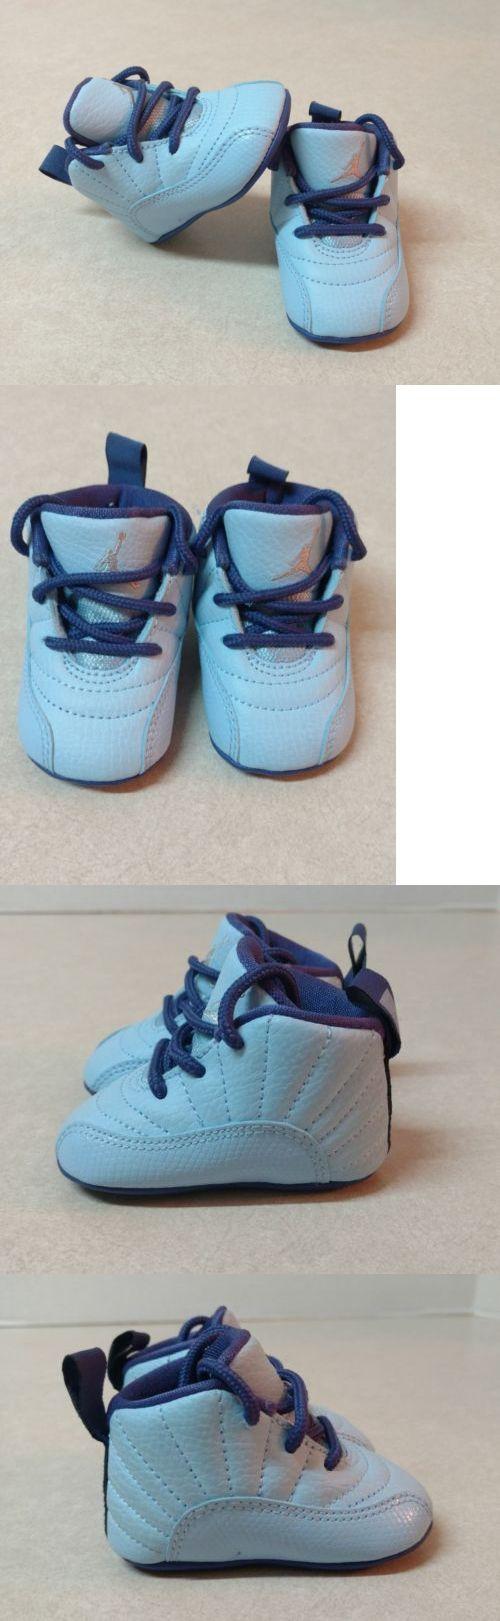 Baby Boy Shoes: Nike Jordan 12 Retro Baby Boy Girl Crib Shoes Blue 378139 418 Size 1C -> BUY IT NOW ONLY: $25.99 on eBay!